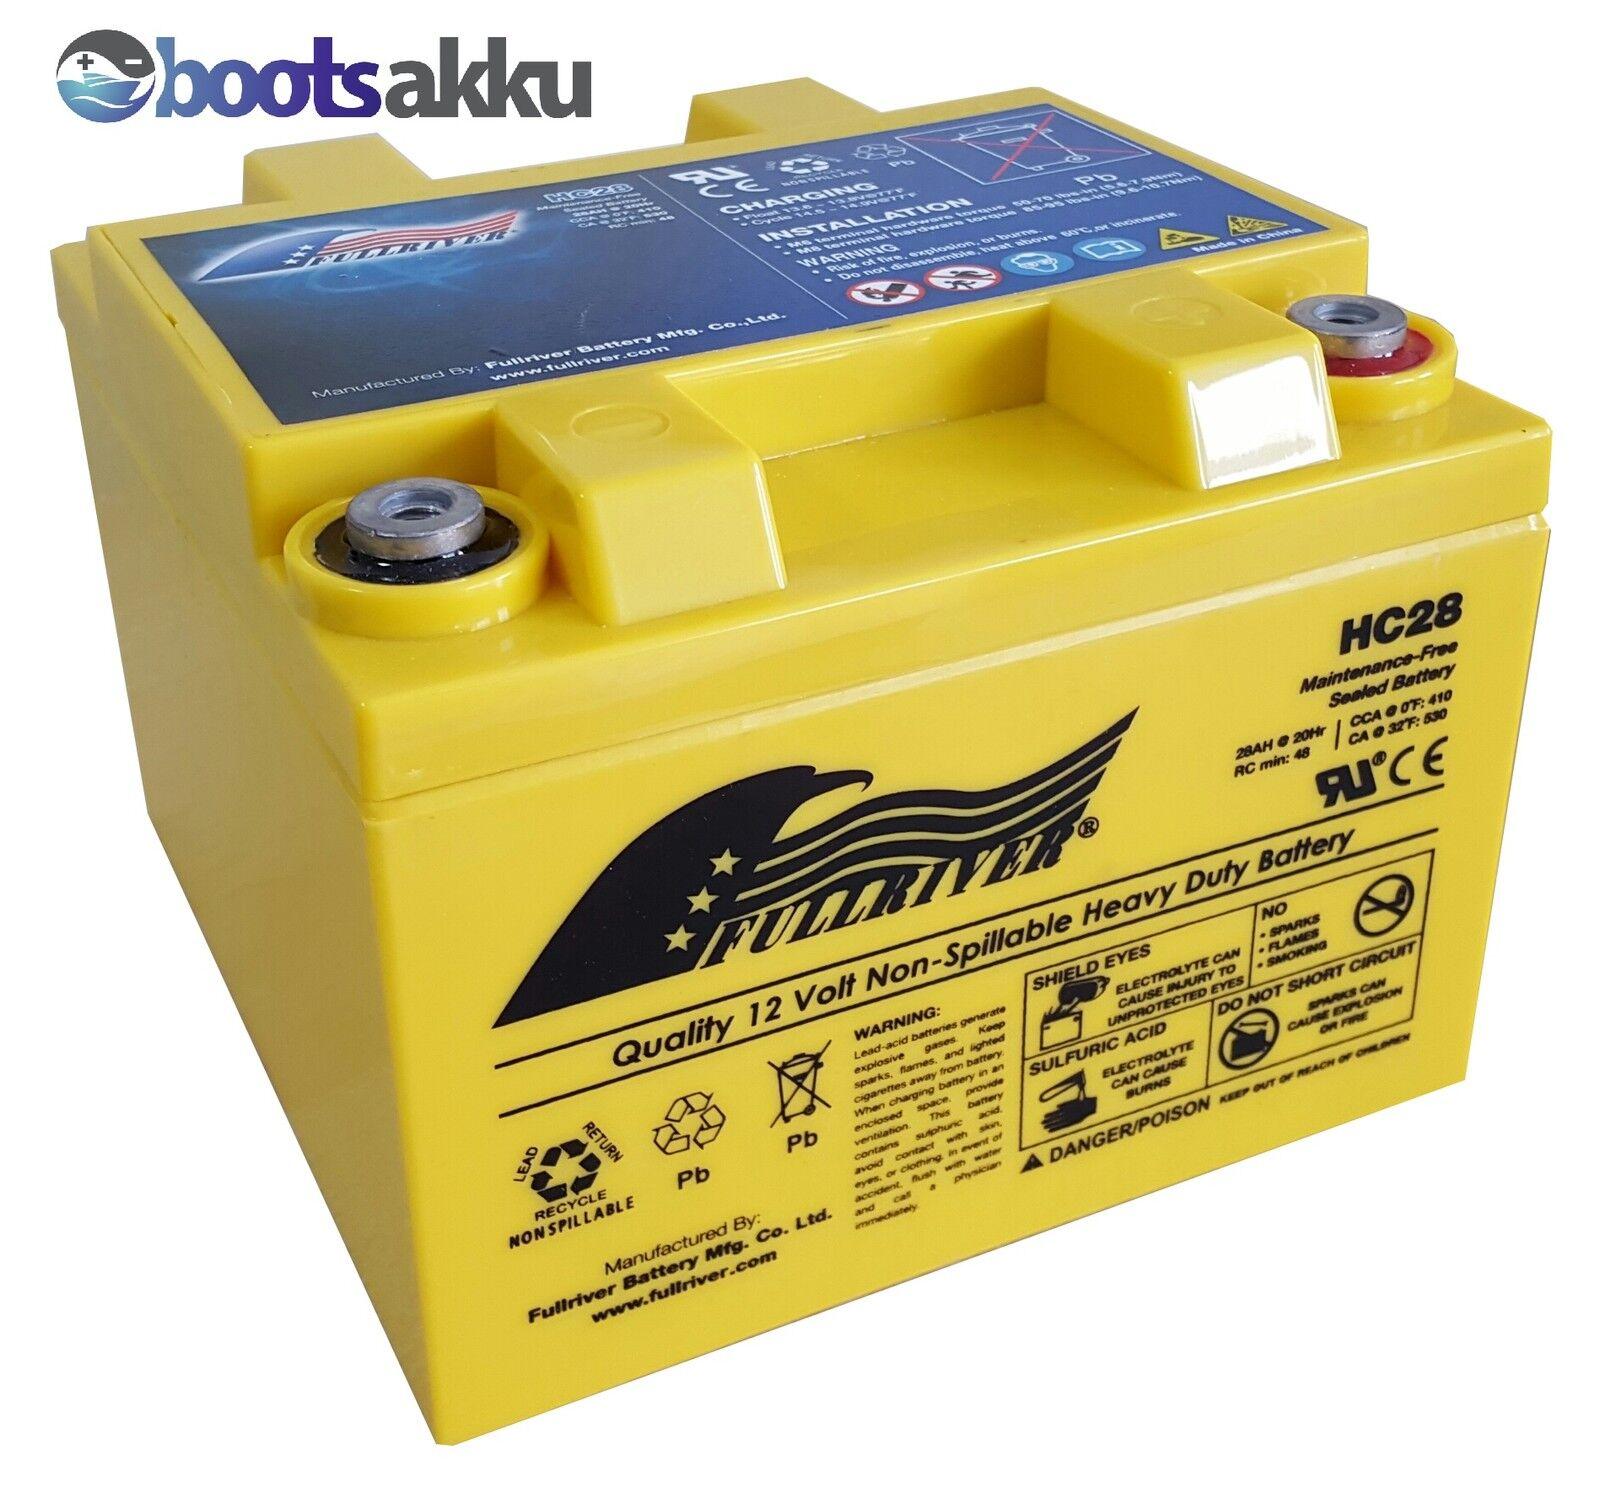 FULLRIVER AGM HC28 AGM FULLRIVER Akku Batterie 12V 28Ah wie Odyssey PC925 GENESIS 12EP26 b00c4e